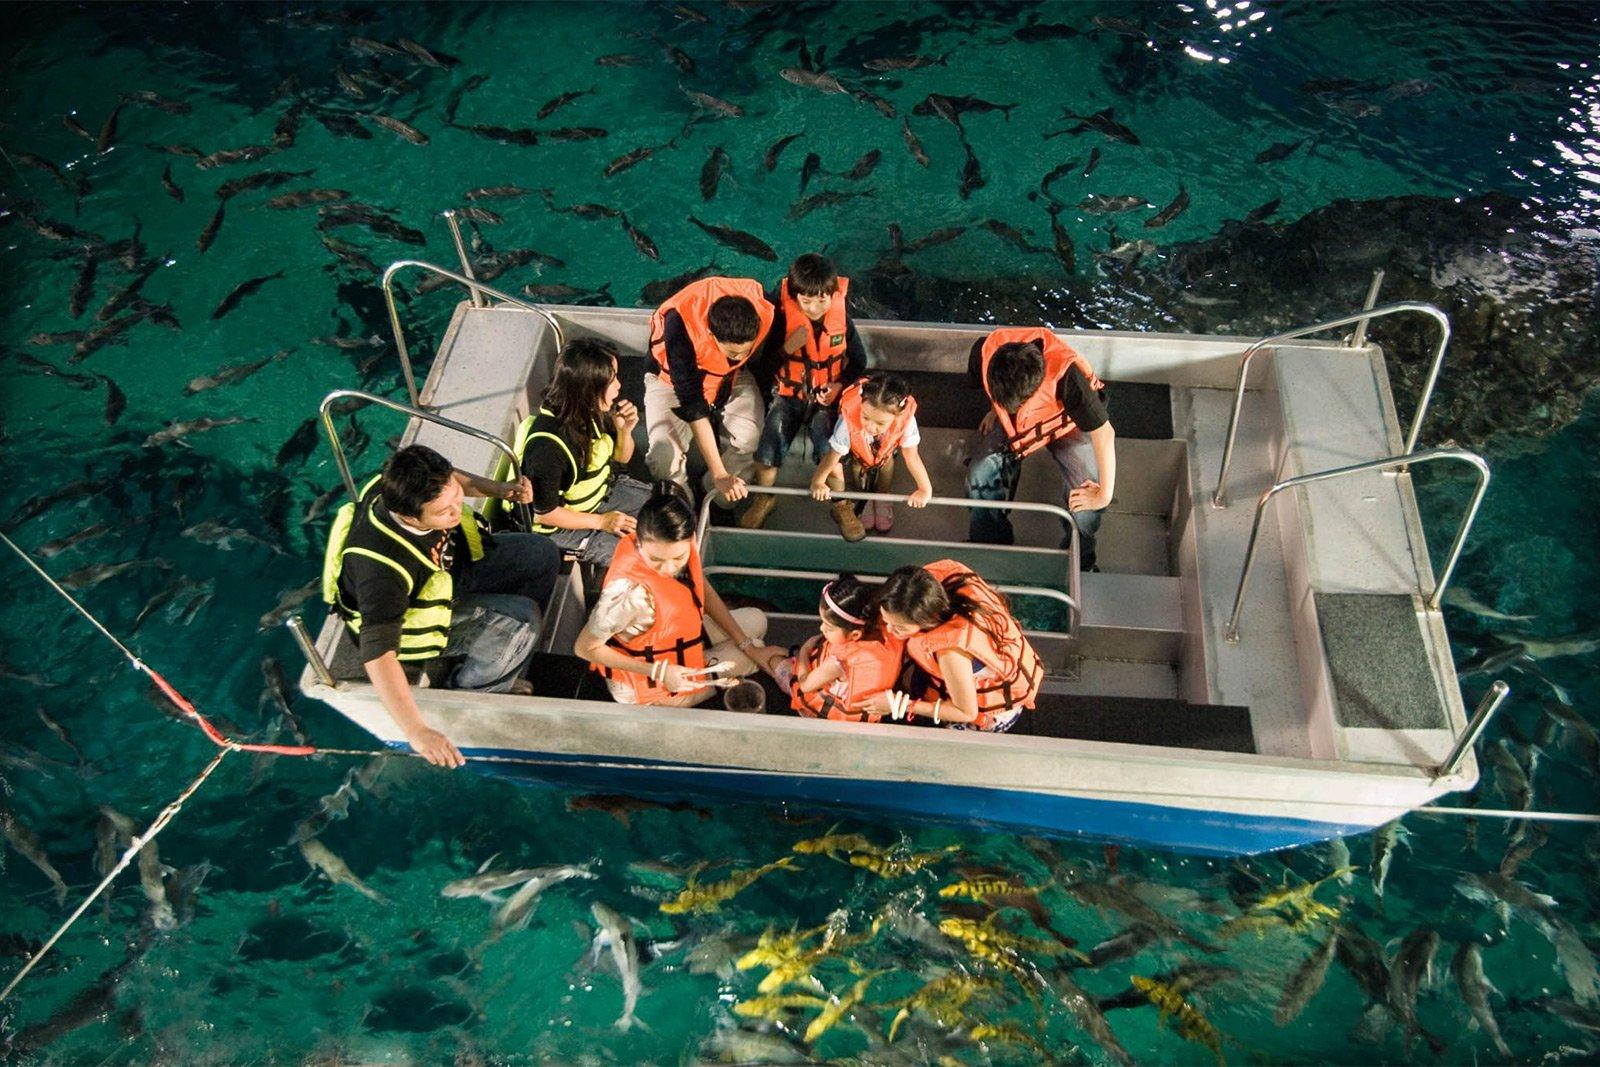 Катание на лодке с прозрачным дном